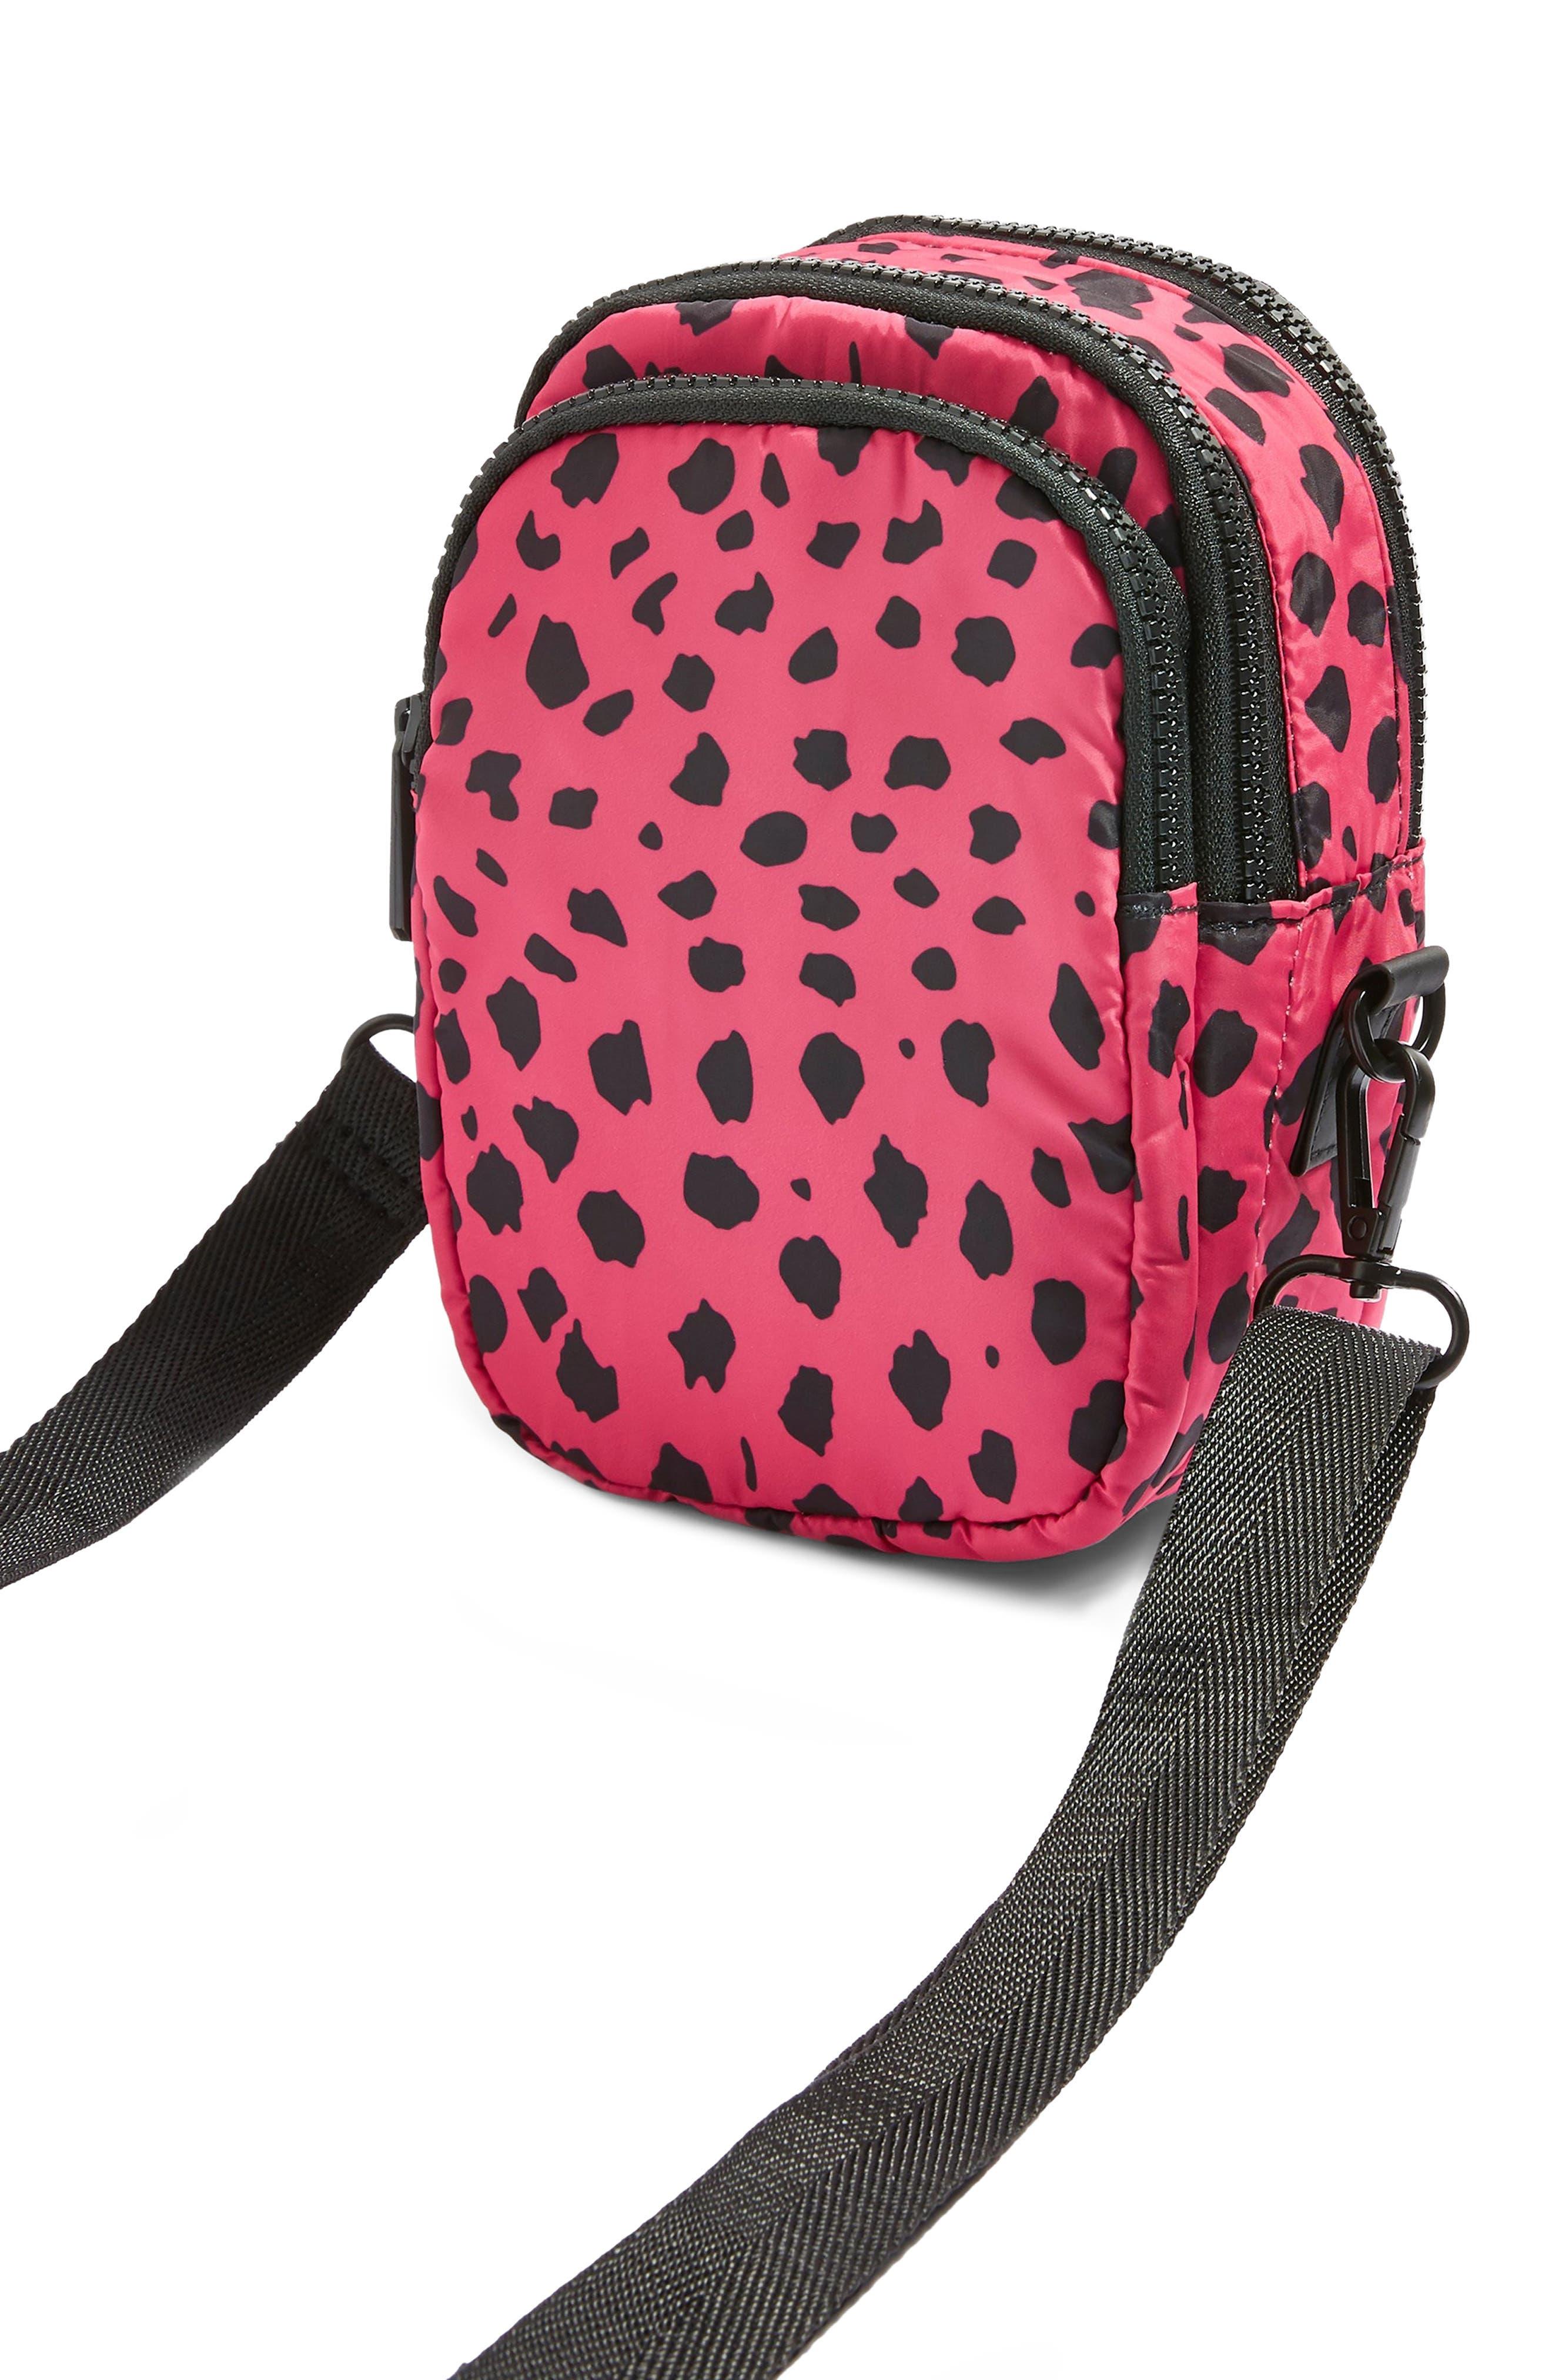 Leopard Print Nylon Shoulder Bag,                             Alternate thumbnail 5, color,                             650